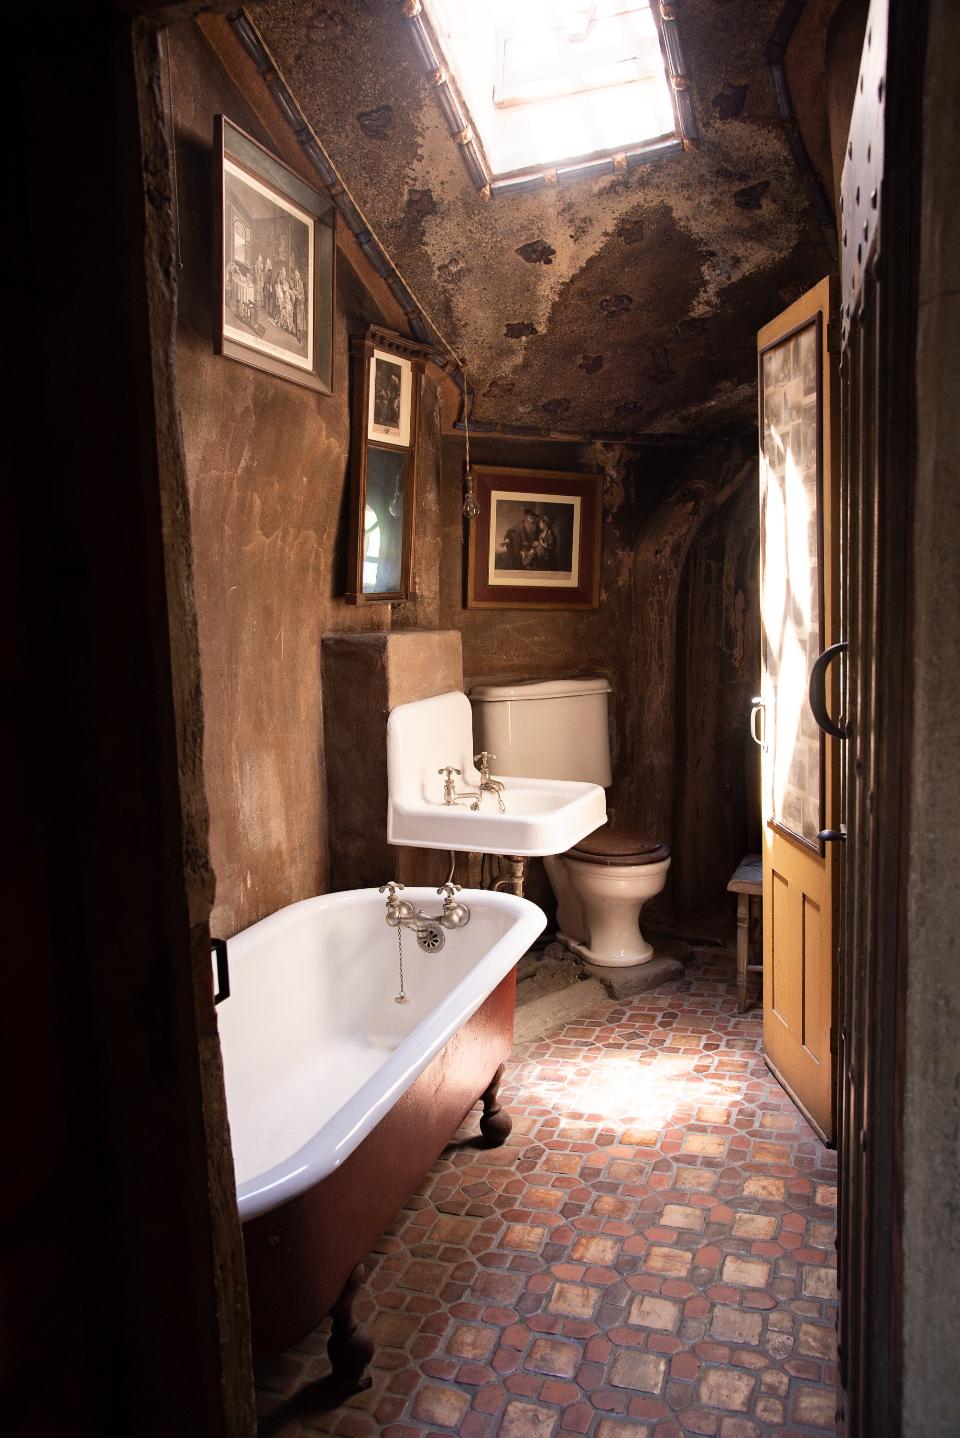 Free Photo of antique, bathroom, house - StockSnap.io on Rustic:s9Dkpzirpk8= Farmhouse Bathroom  id=19514